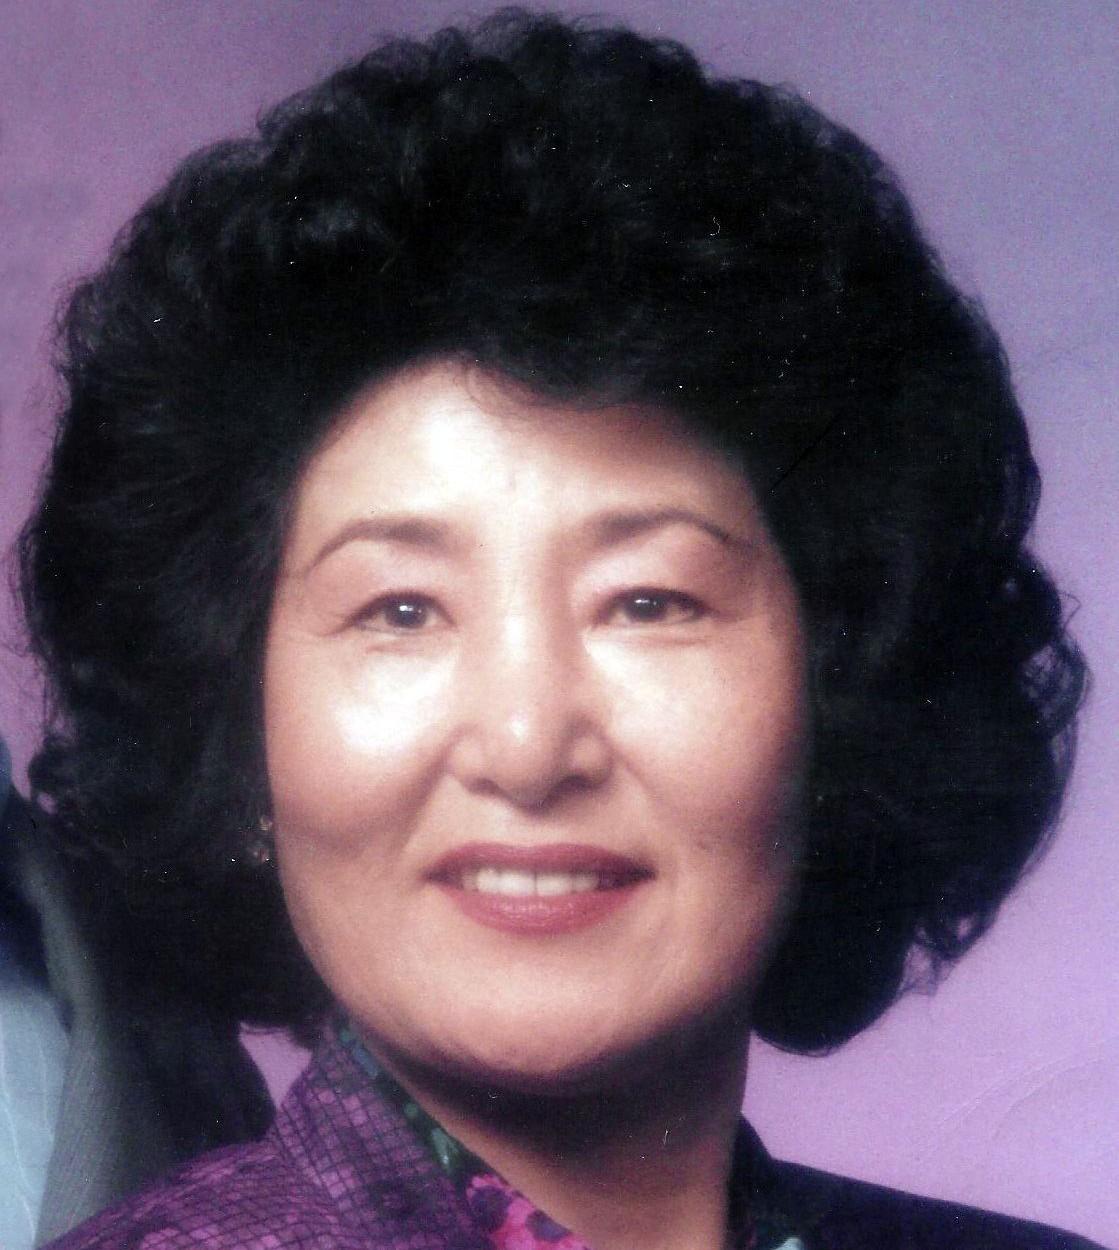 Sunhe Lee Ashurst